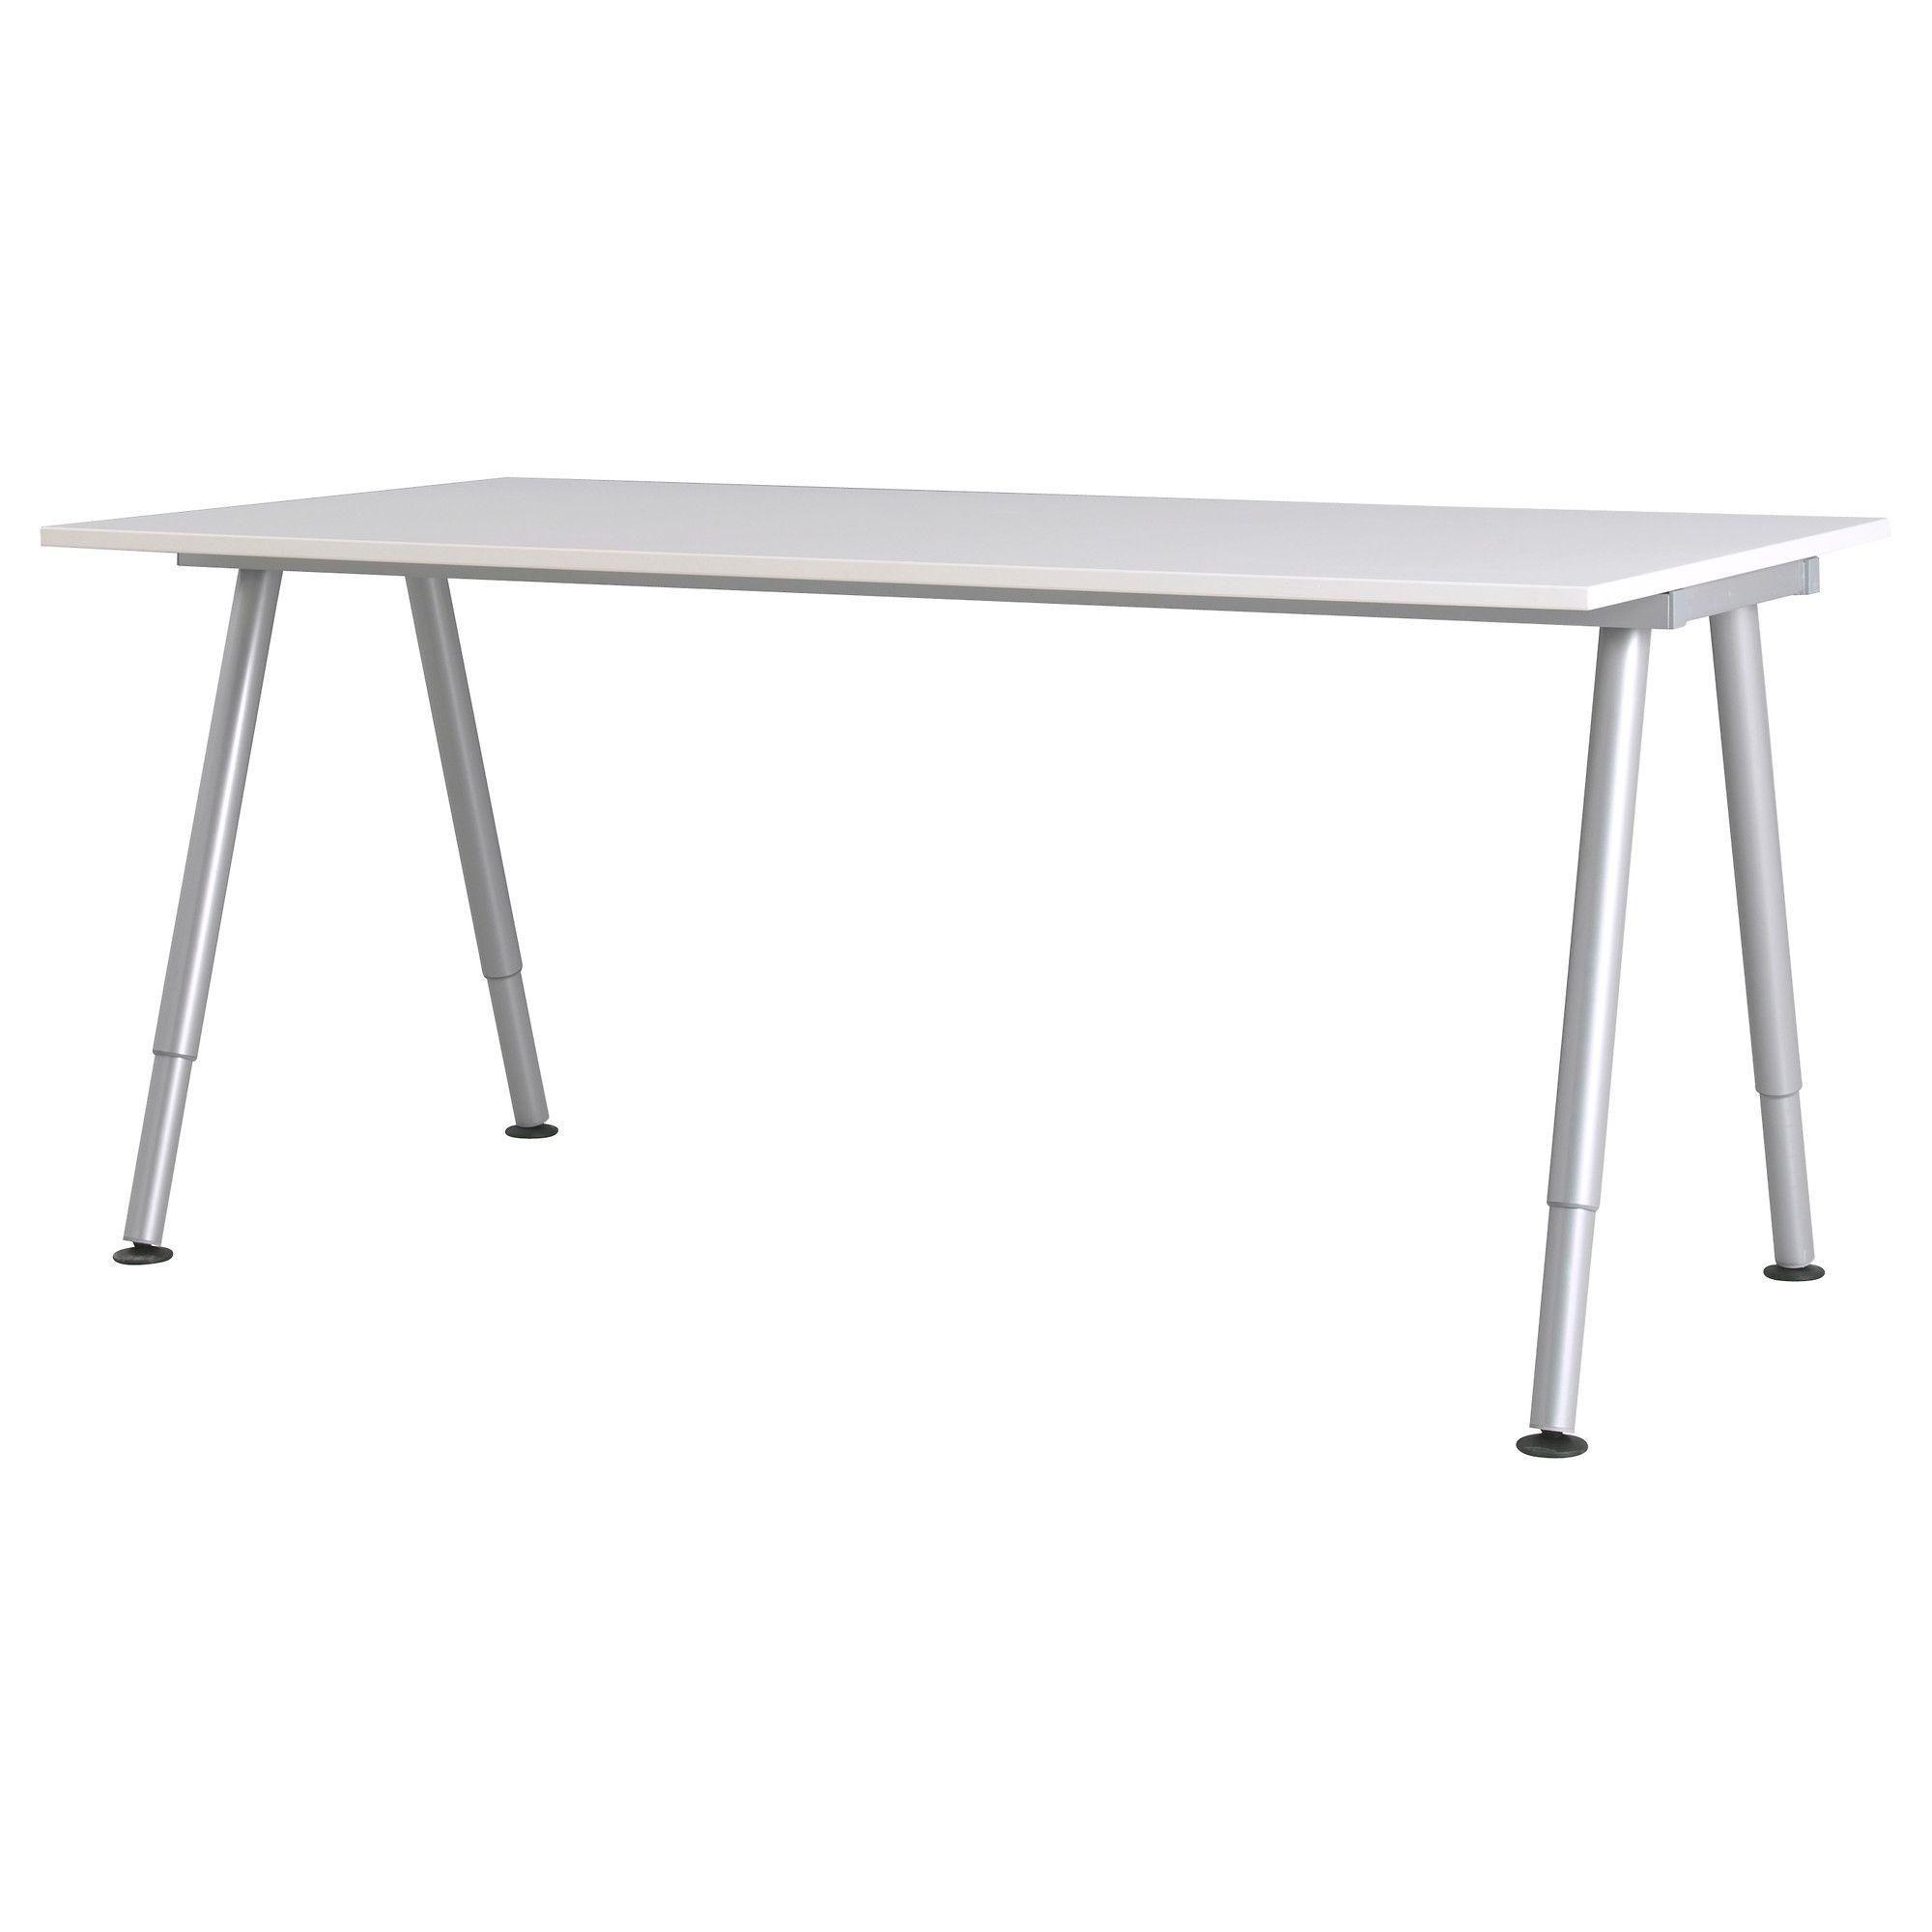 Extreem Iets Nieuws Ikea Galant Tafel #NDP57 - AgnesWaMu #SG08